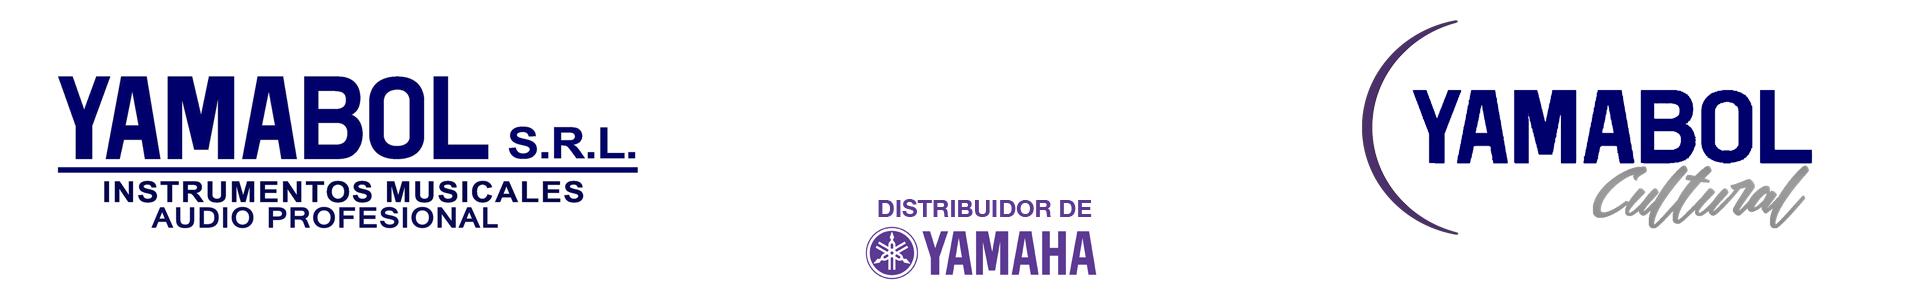 YAMABOL S.R.L.